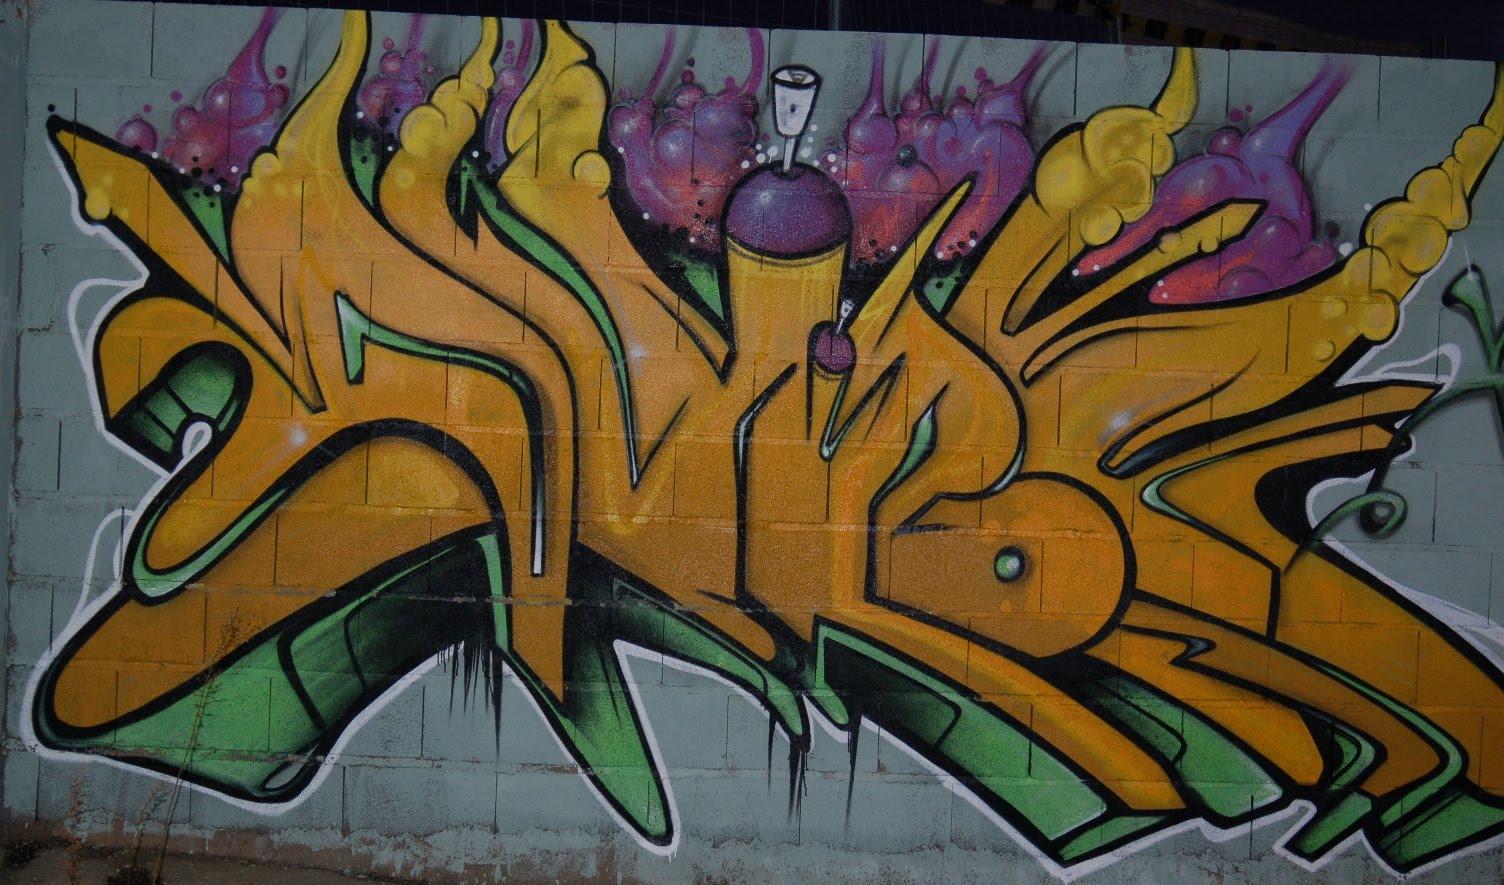 el blog de ma m s graffitis de granada arte urbano primera parte